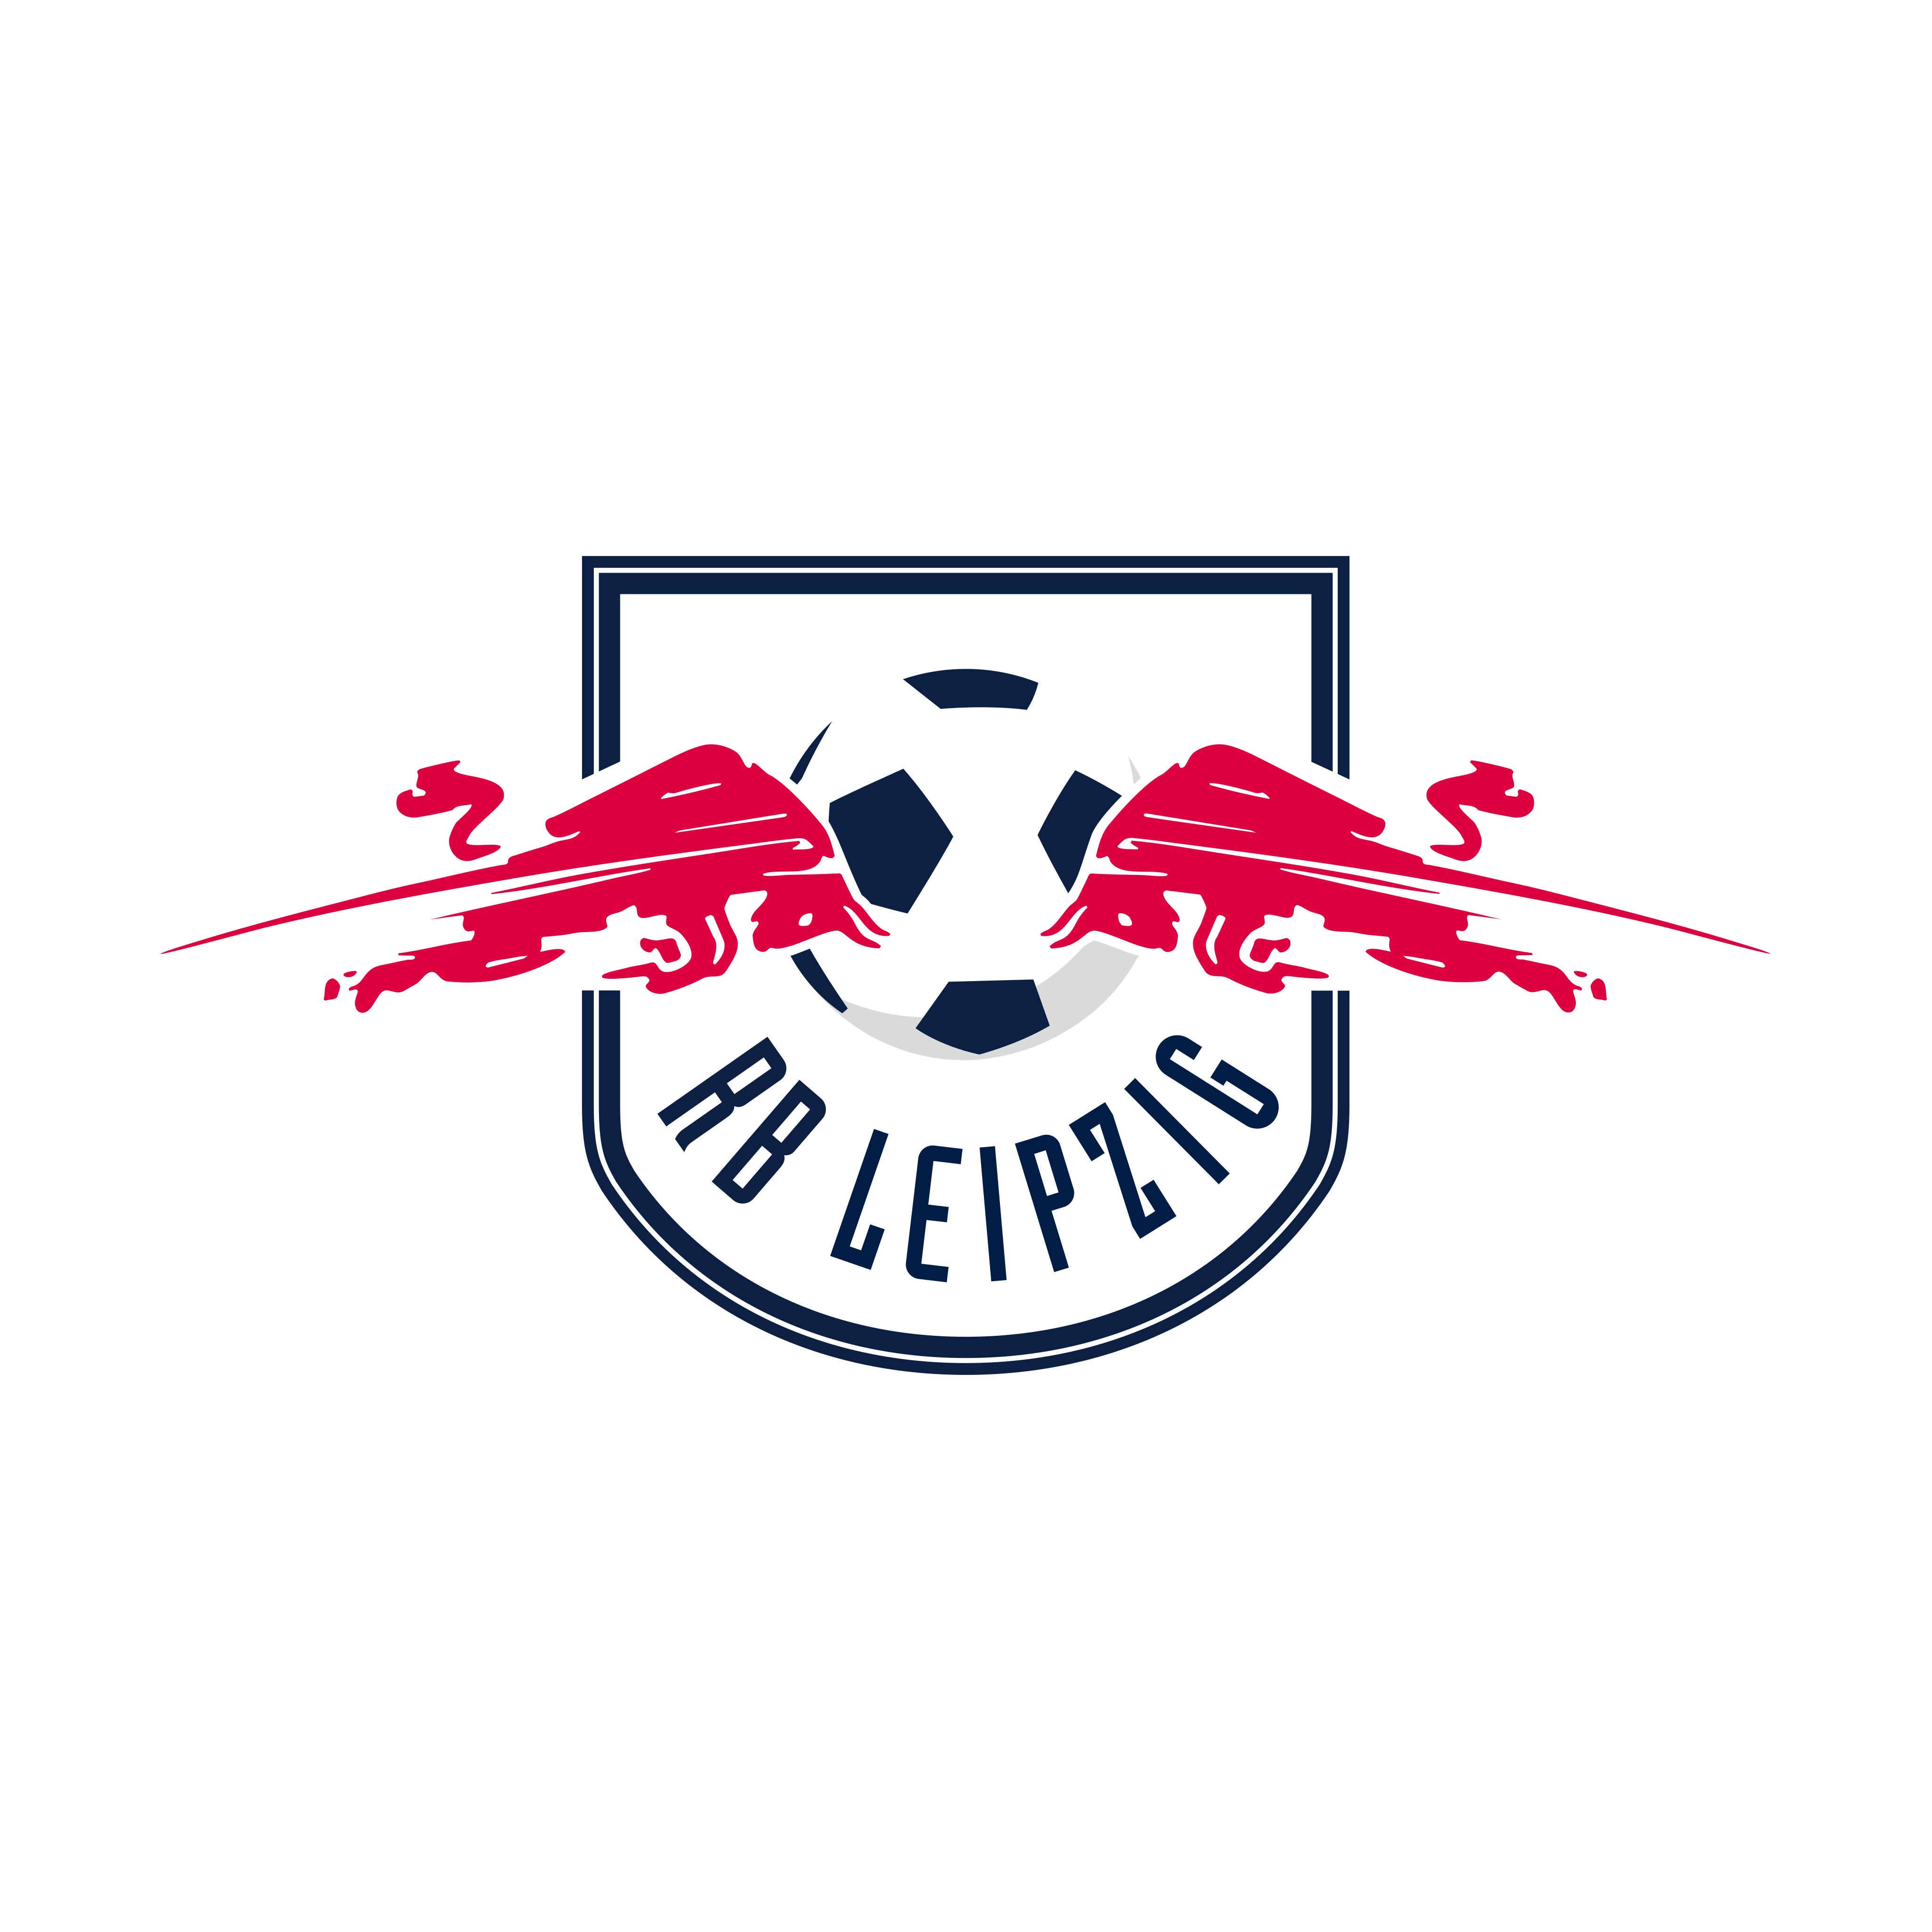 rb leipzig logo 0 - RB Leipzig Logo